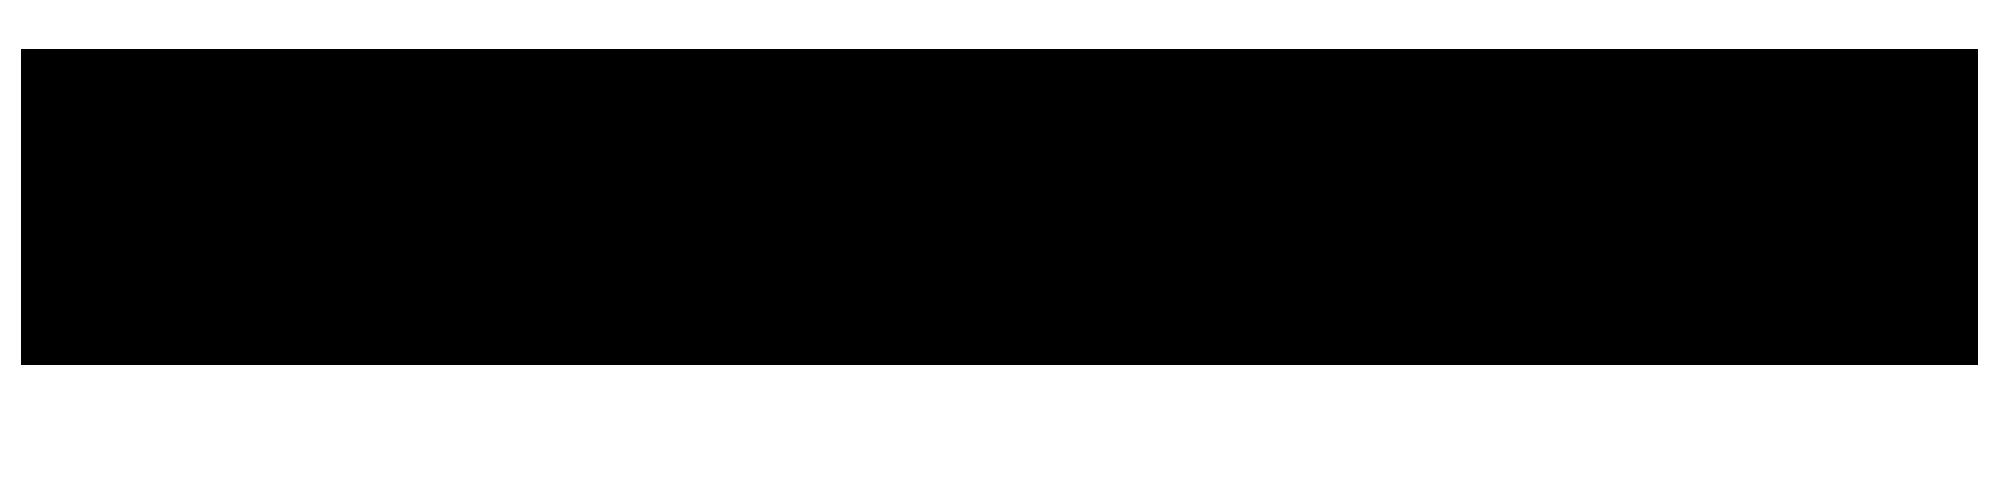 rastlos.info